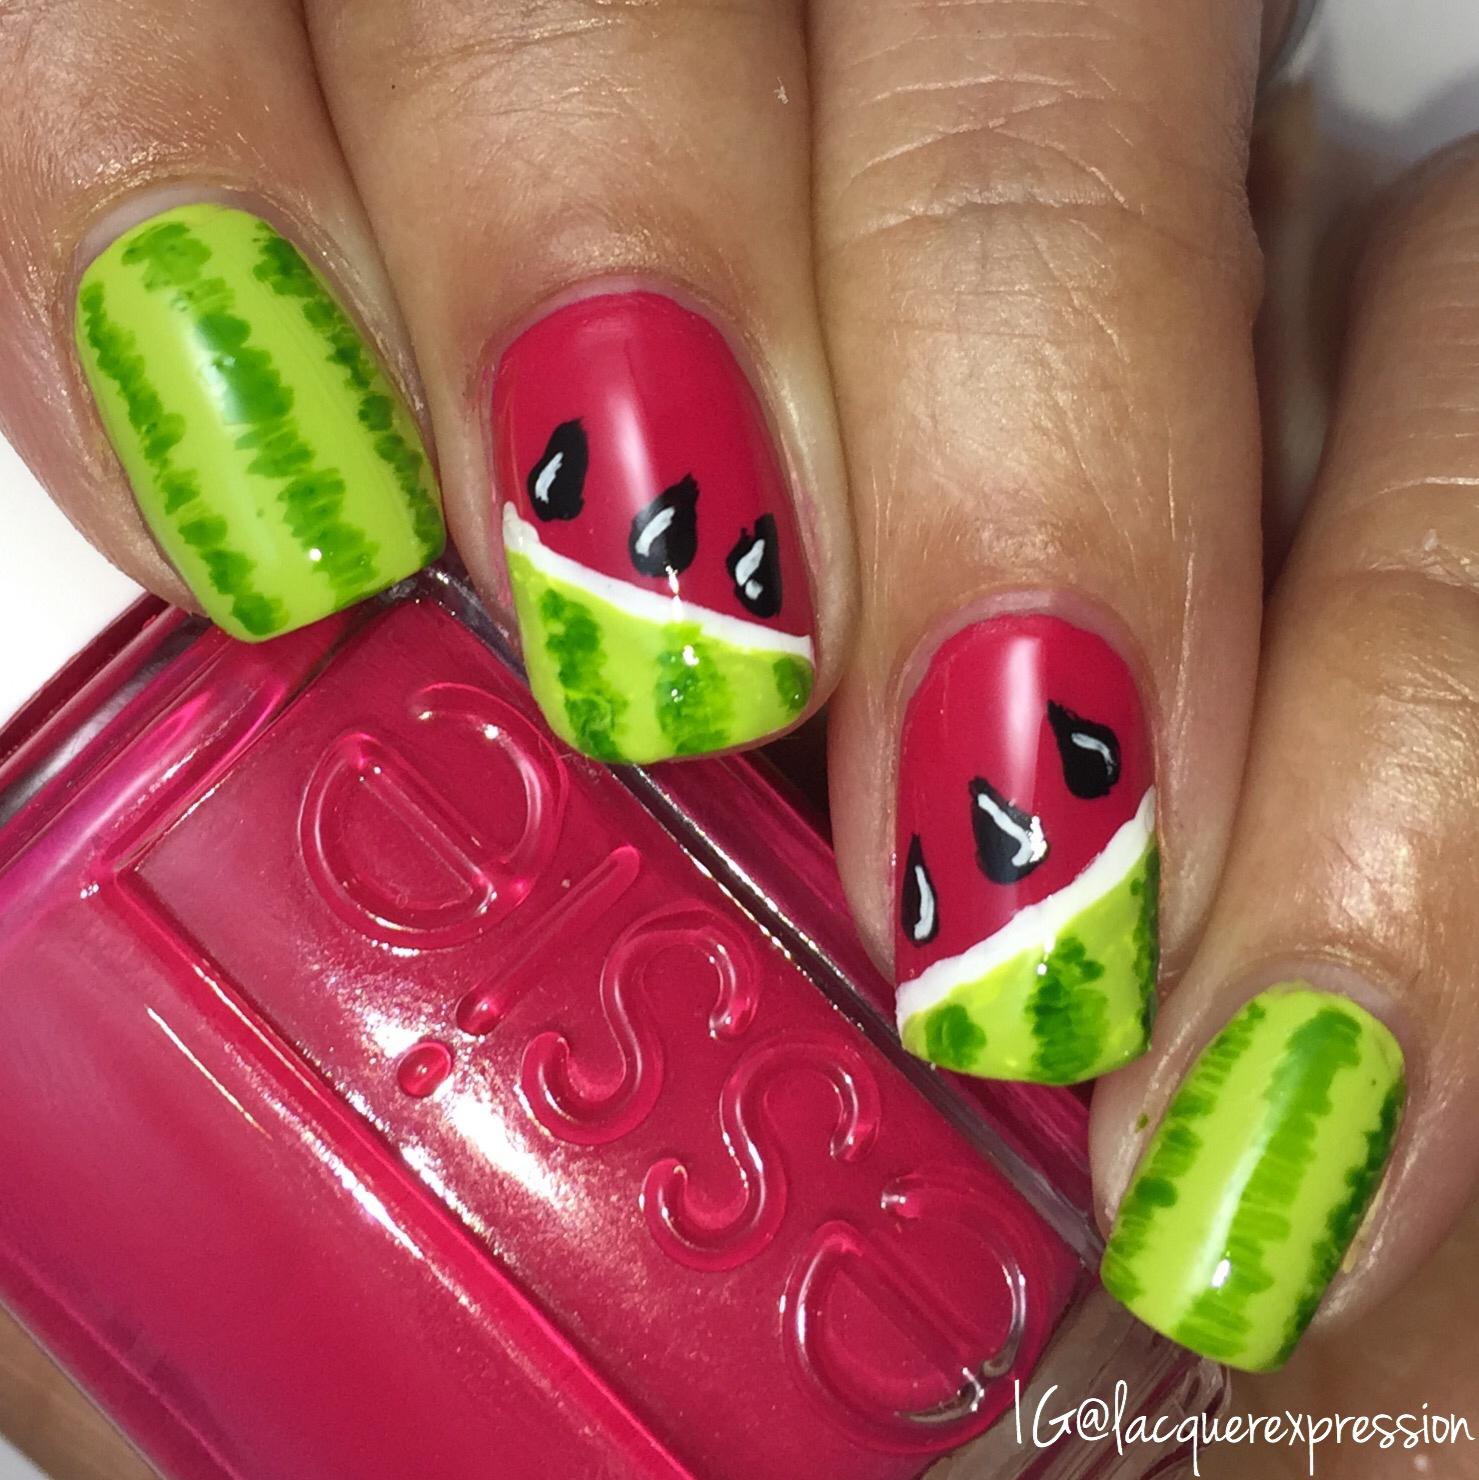 Nail Art - Watermelon Nails - LacquerExpression